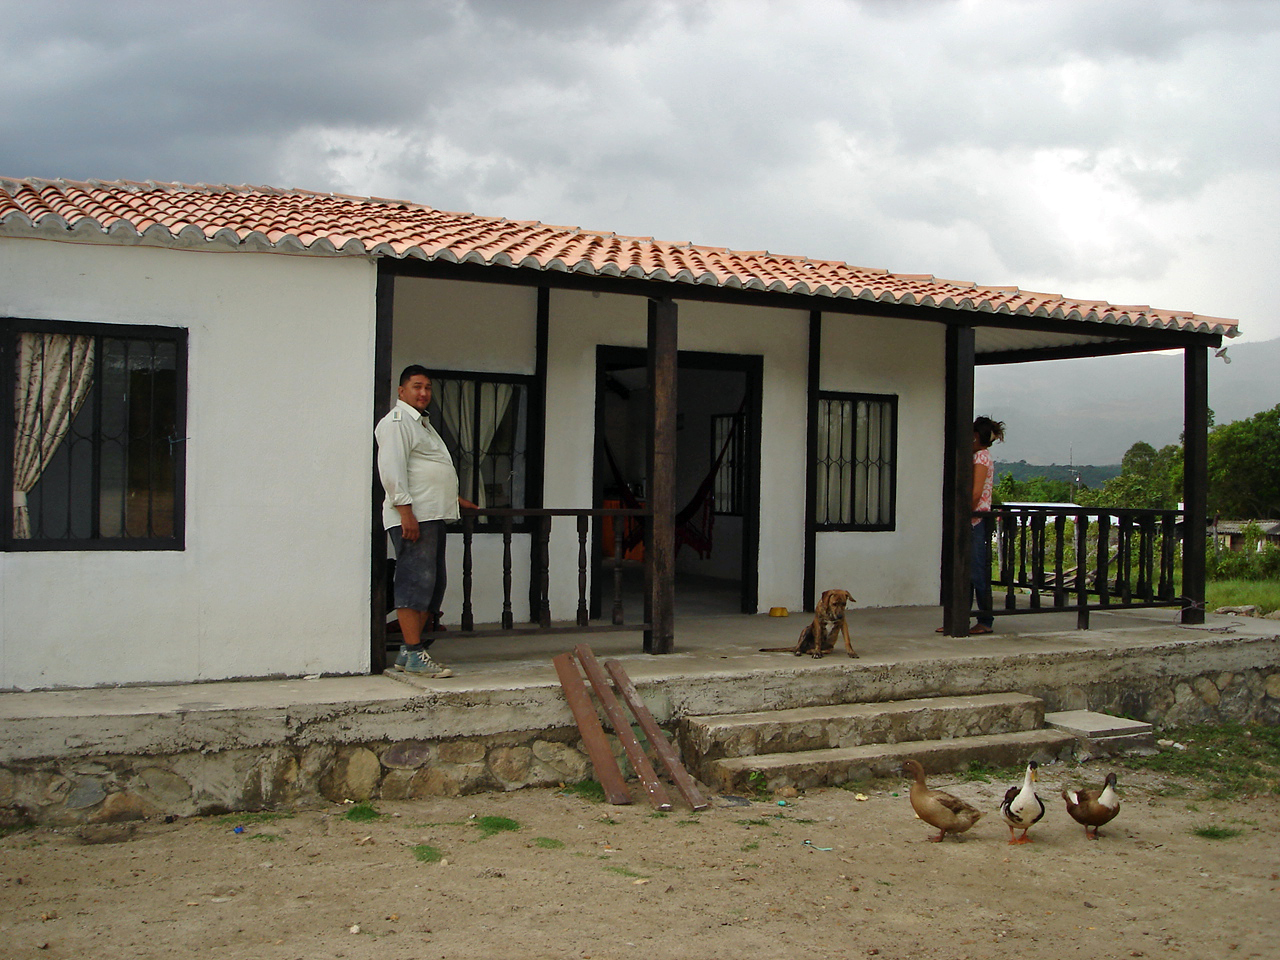 Casas prefabricadas casas prefabricadas modelos for Modelos casas prefabricadas